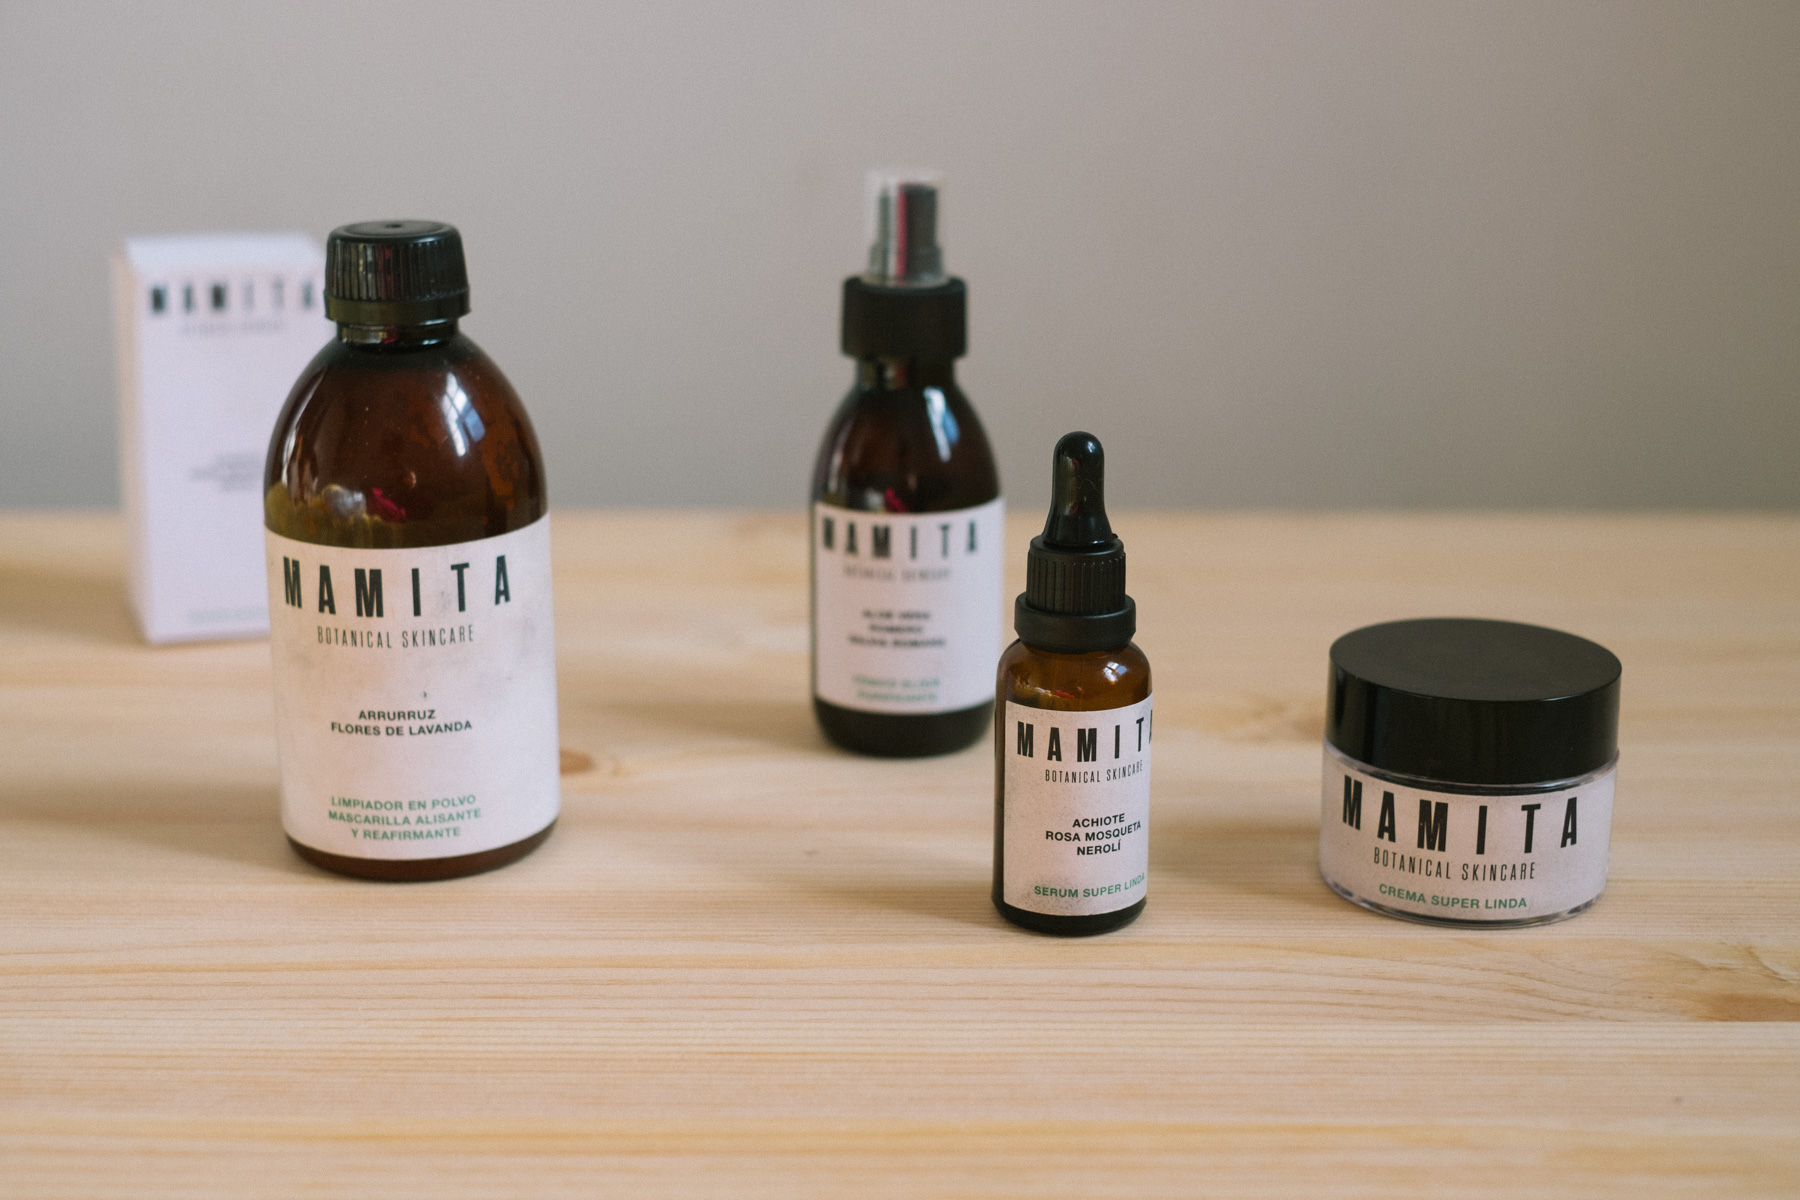 mamita botanical skincare